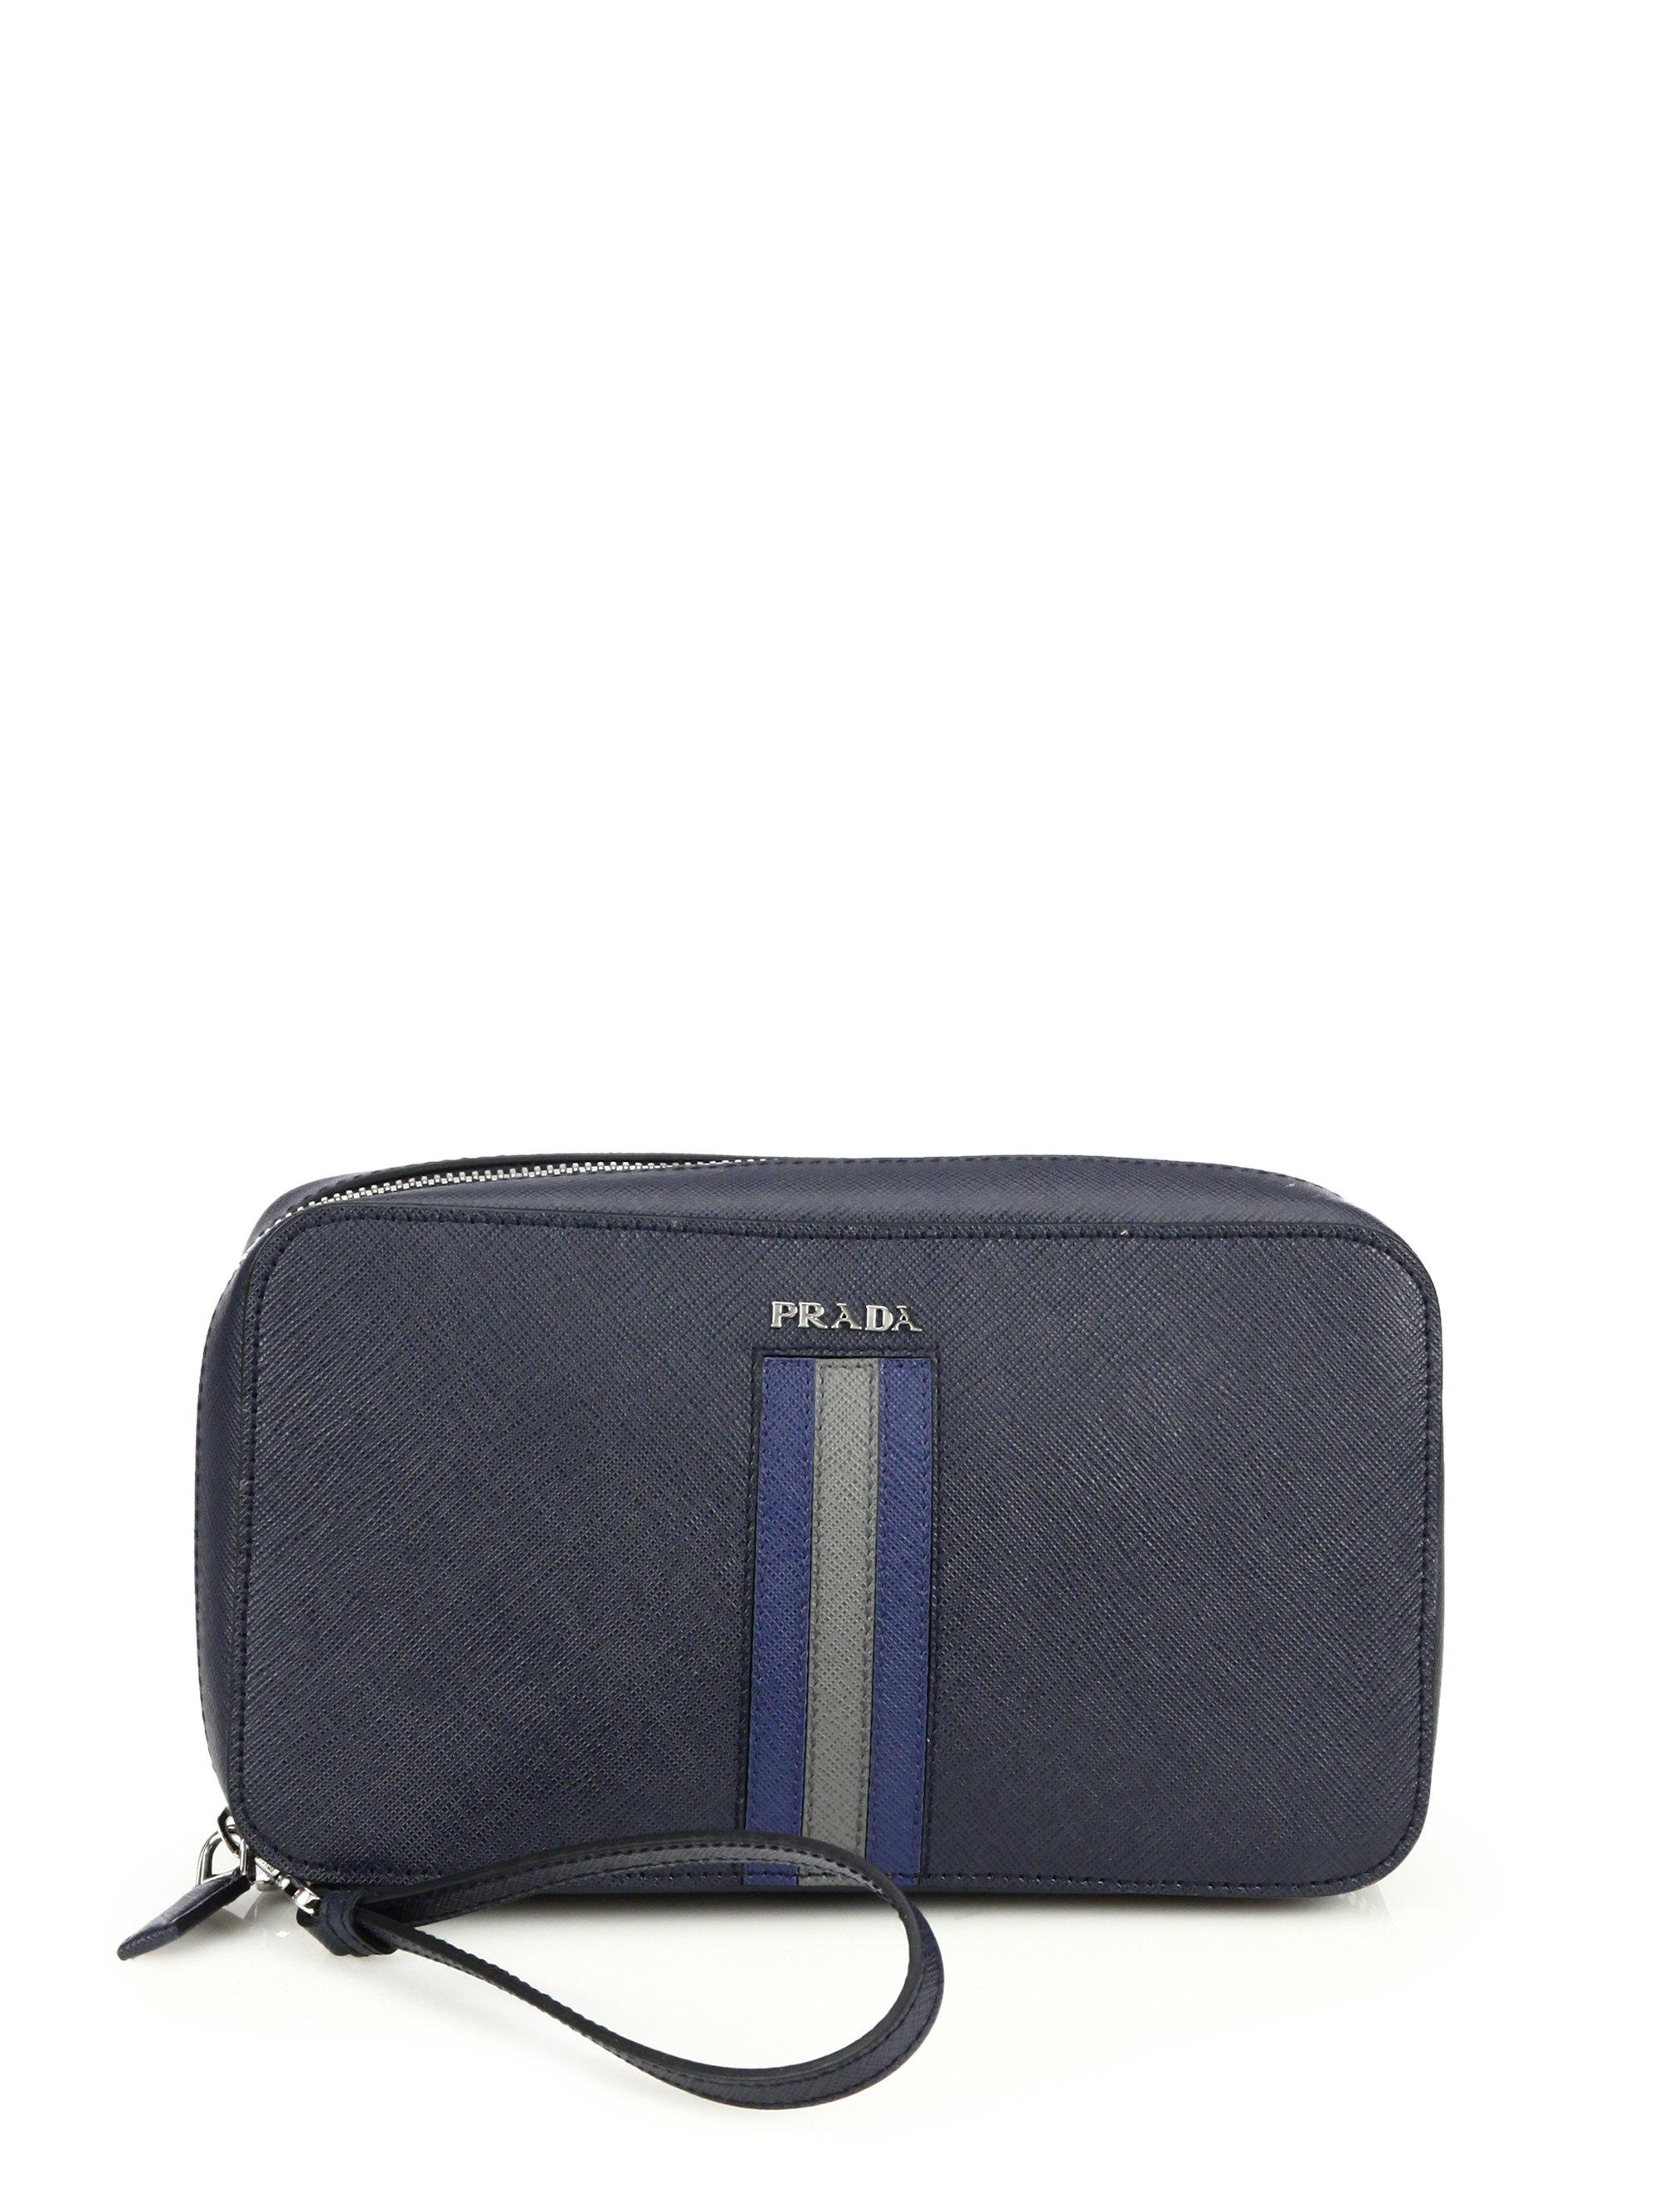 prada brown leather bowler bag - prada pouch baltic blue